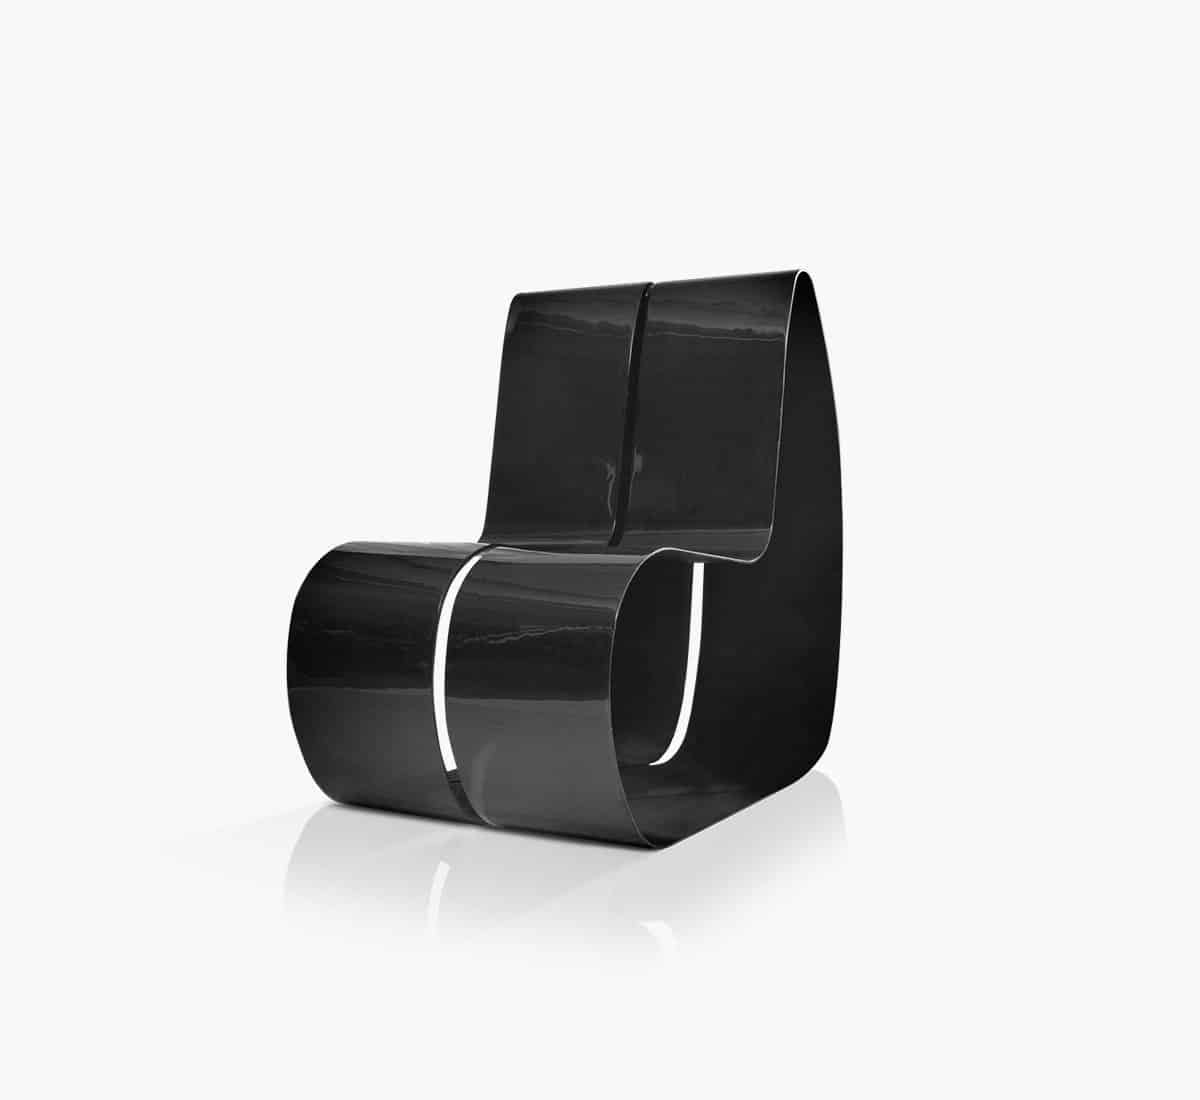 Angleless chair designed by Andrea Fino and Samanta Snidaro